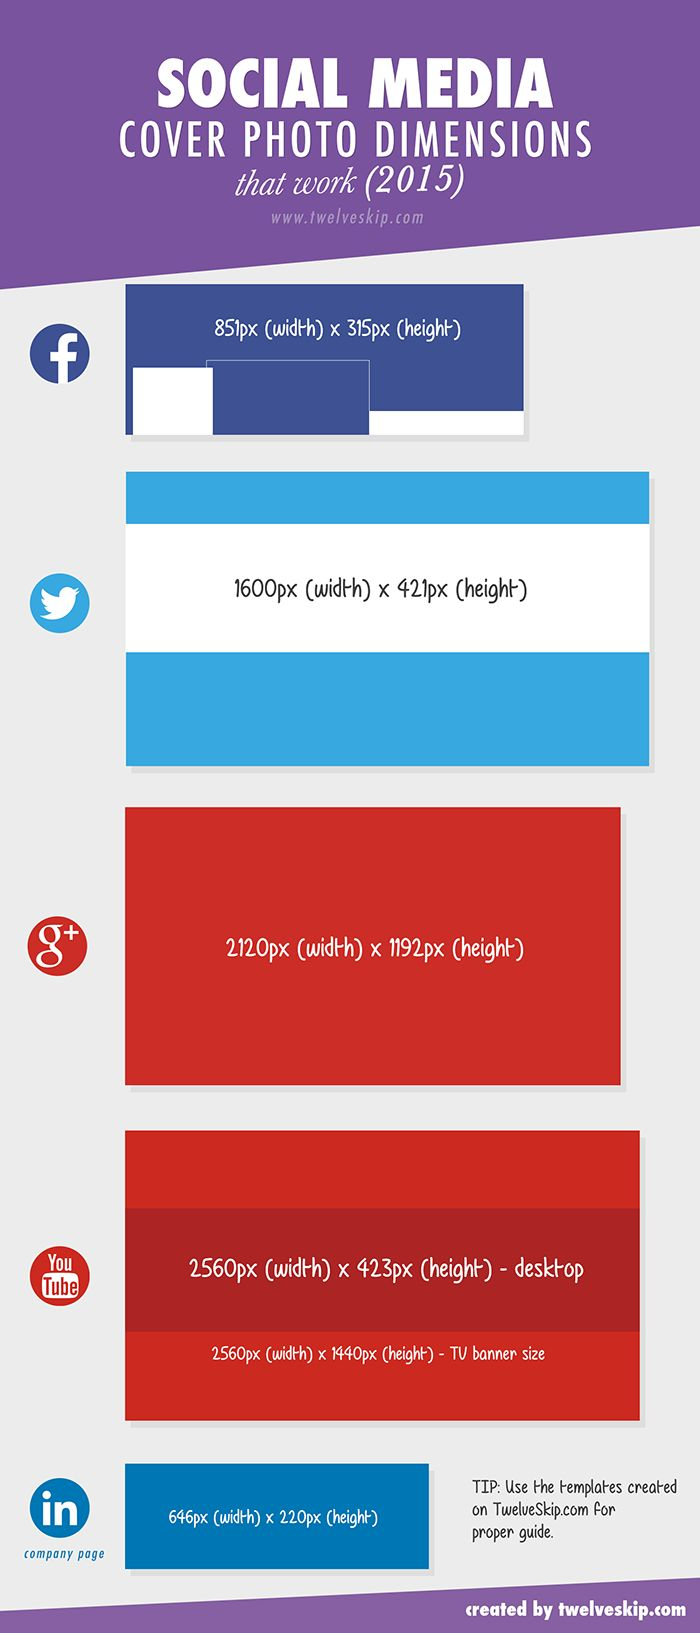 upload is 2MB. Standard logo size: must be 100 x 60 pixels. Square logo size: 50 x 50 pixel